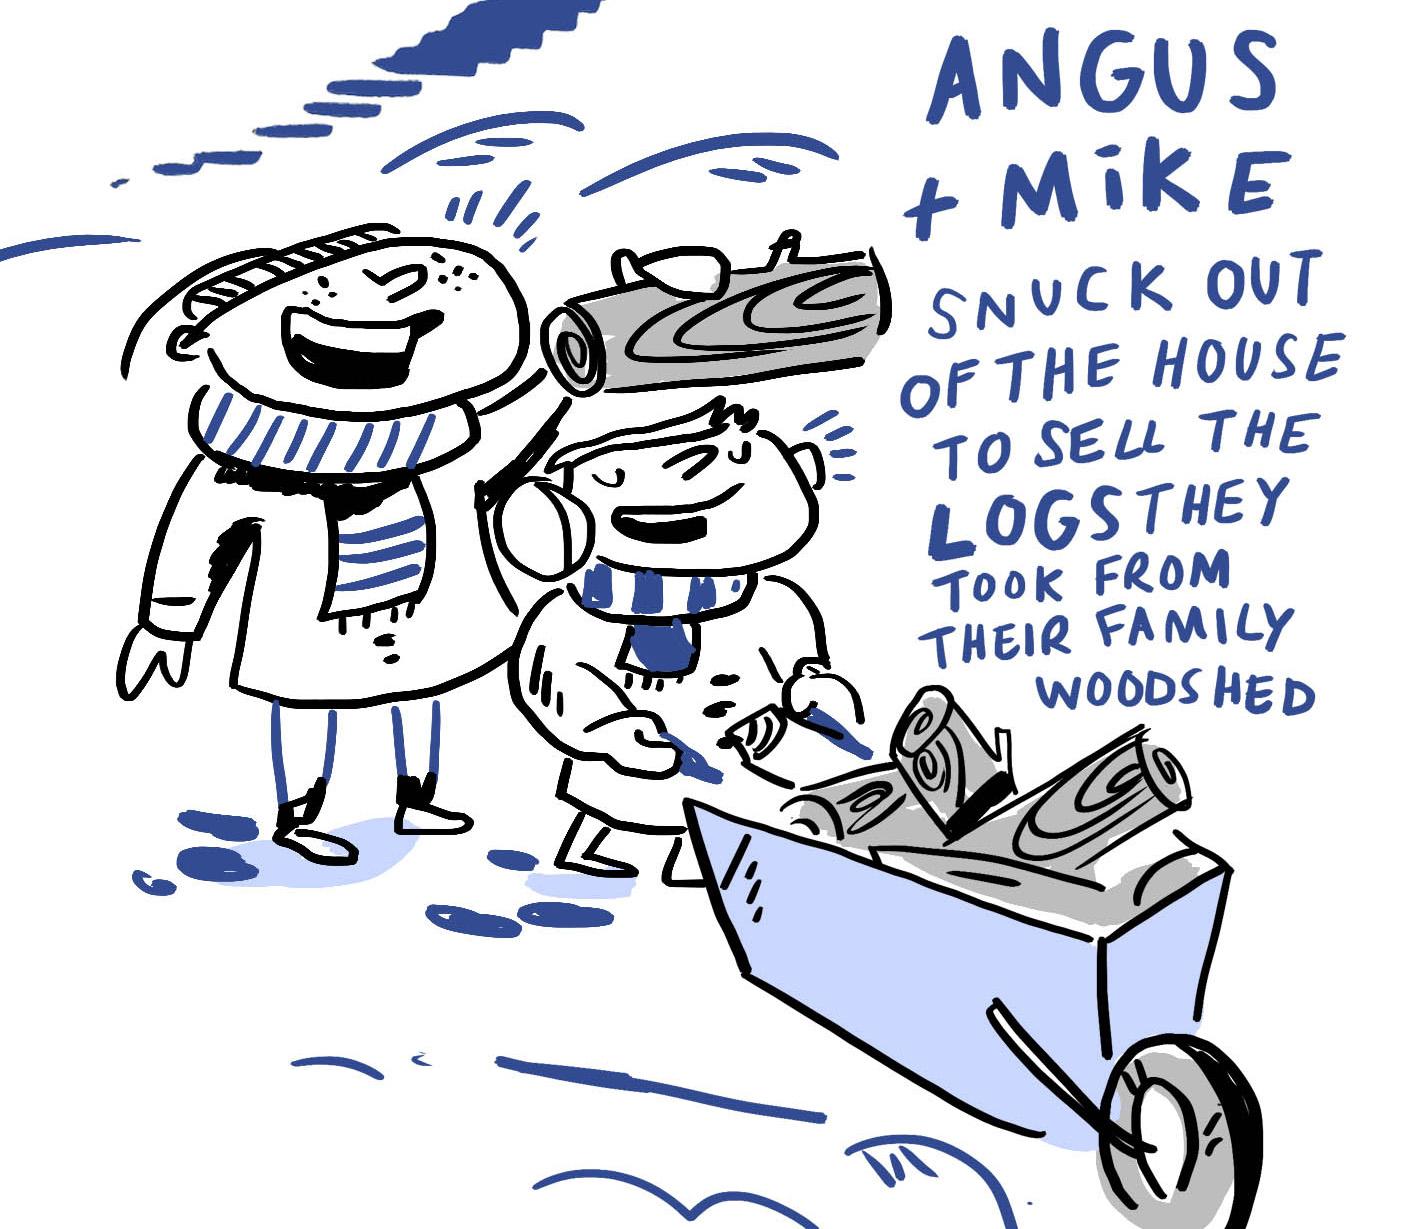 Scribing the highlights of Professor Angus Wallace's extraordinary career   Scriberia